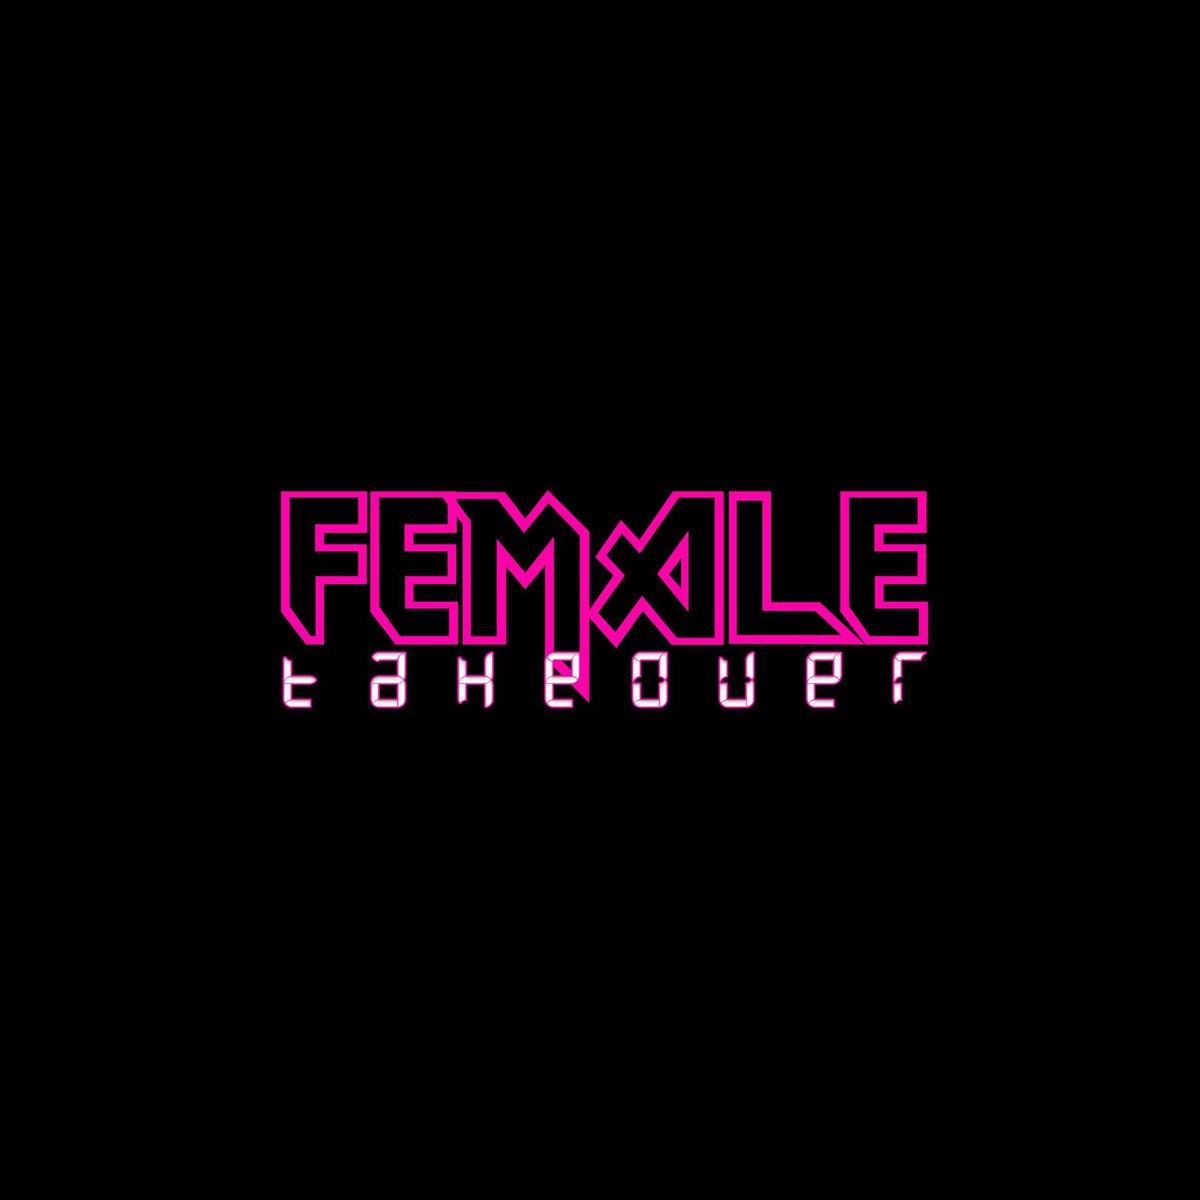 FEMALE TAKEOVER 6pm-8pm Listen via the website 👇🏾 http://www.leicestercommunityradio.com Listen via Tune in app on your phones 👉🏽http://tun.in/sfqTk #leicestercommunityradio #leicester